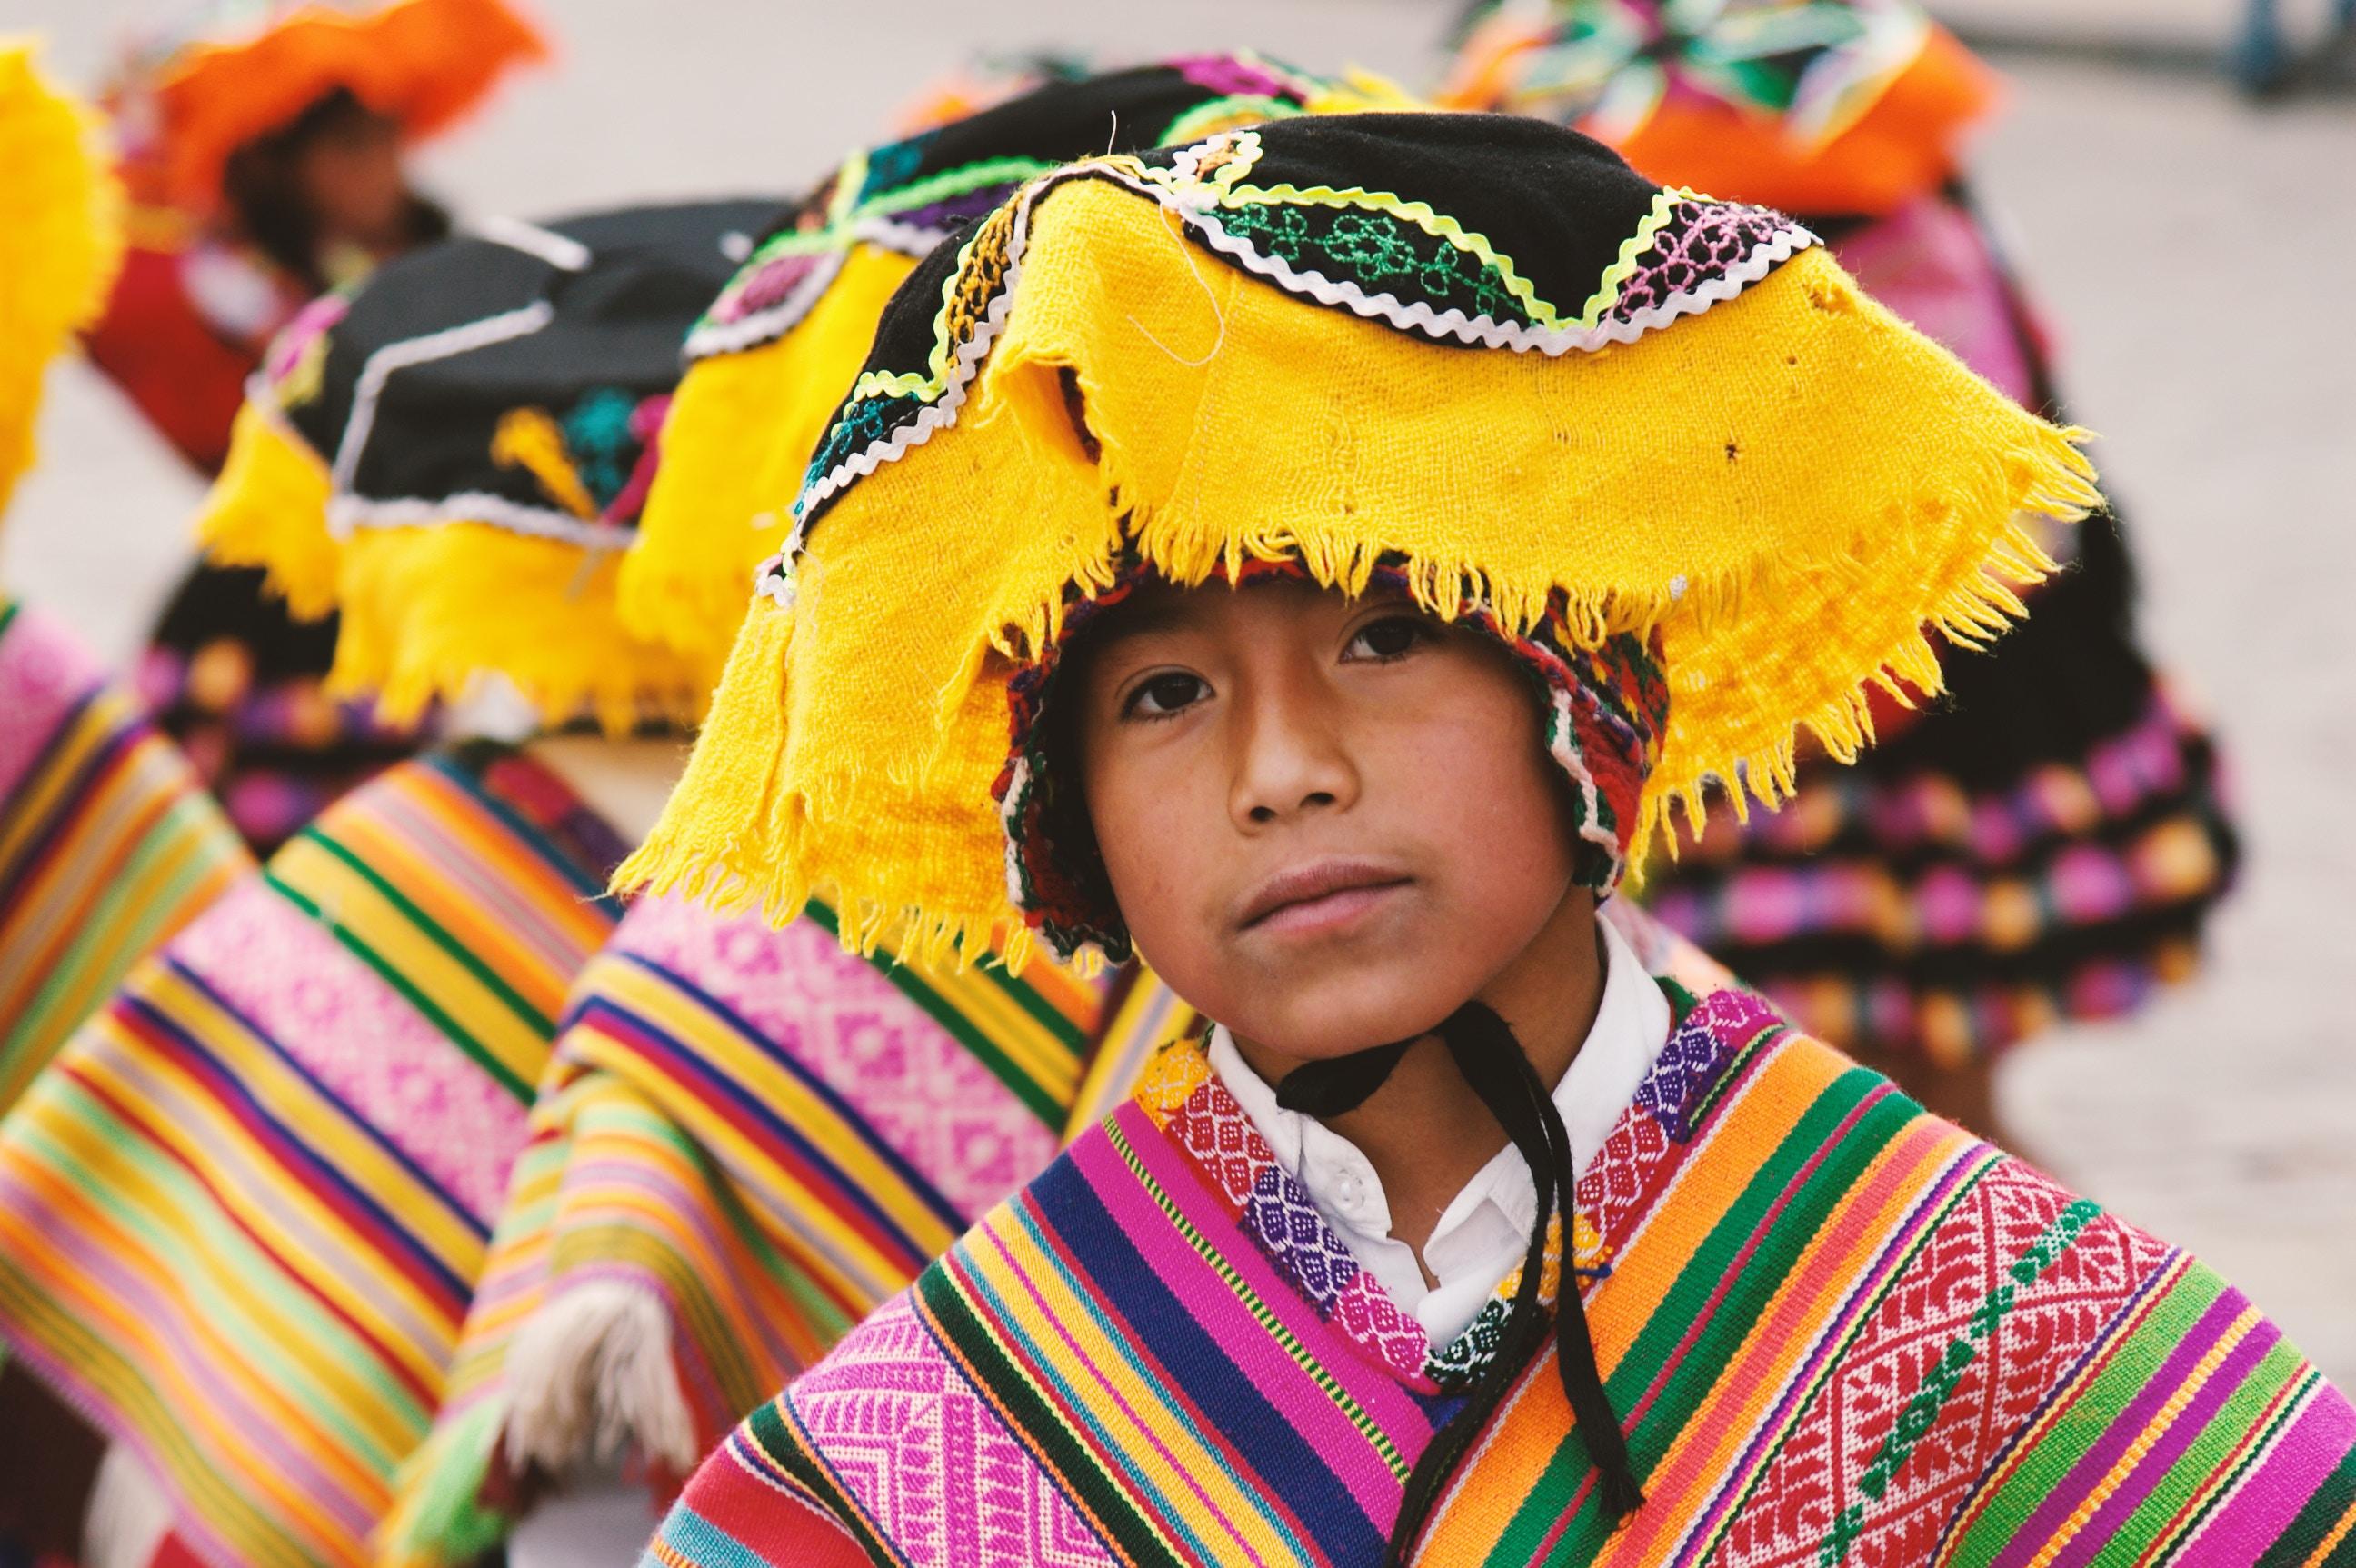 5 platos de comida peruana que debes probar